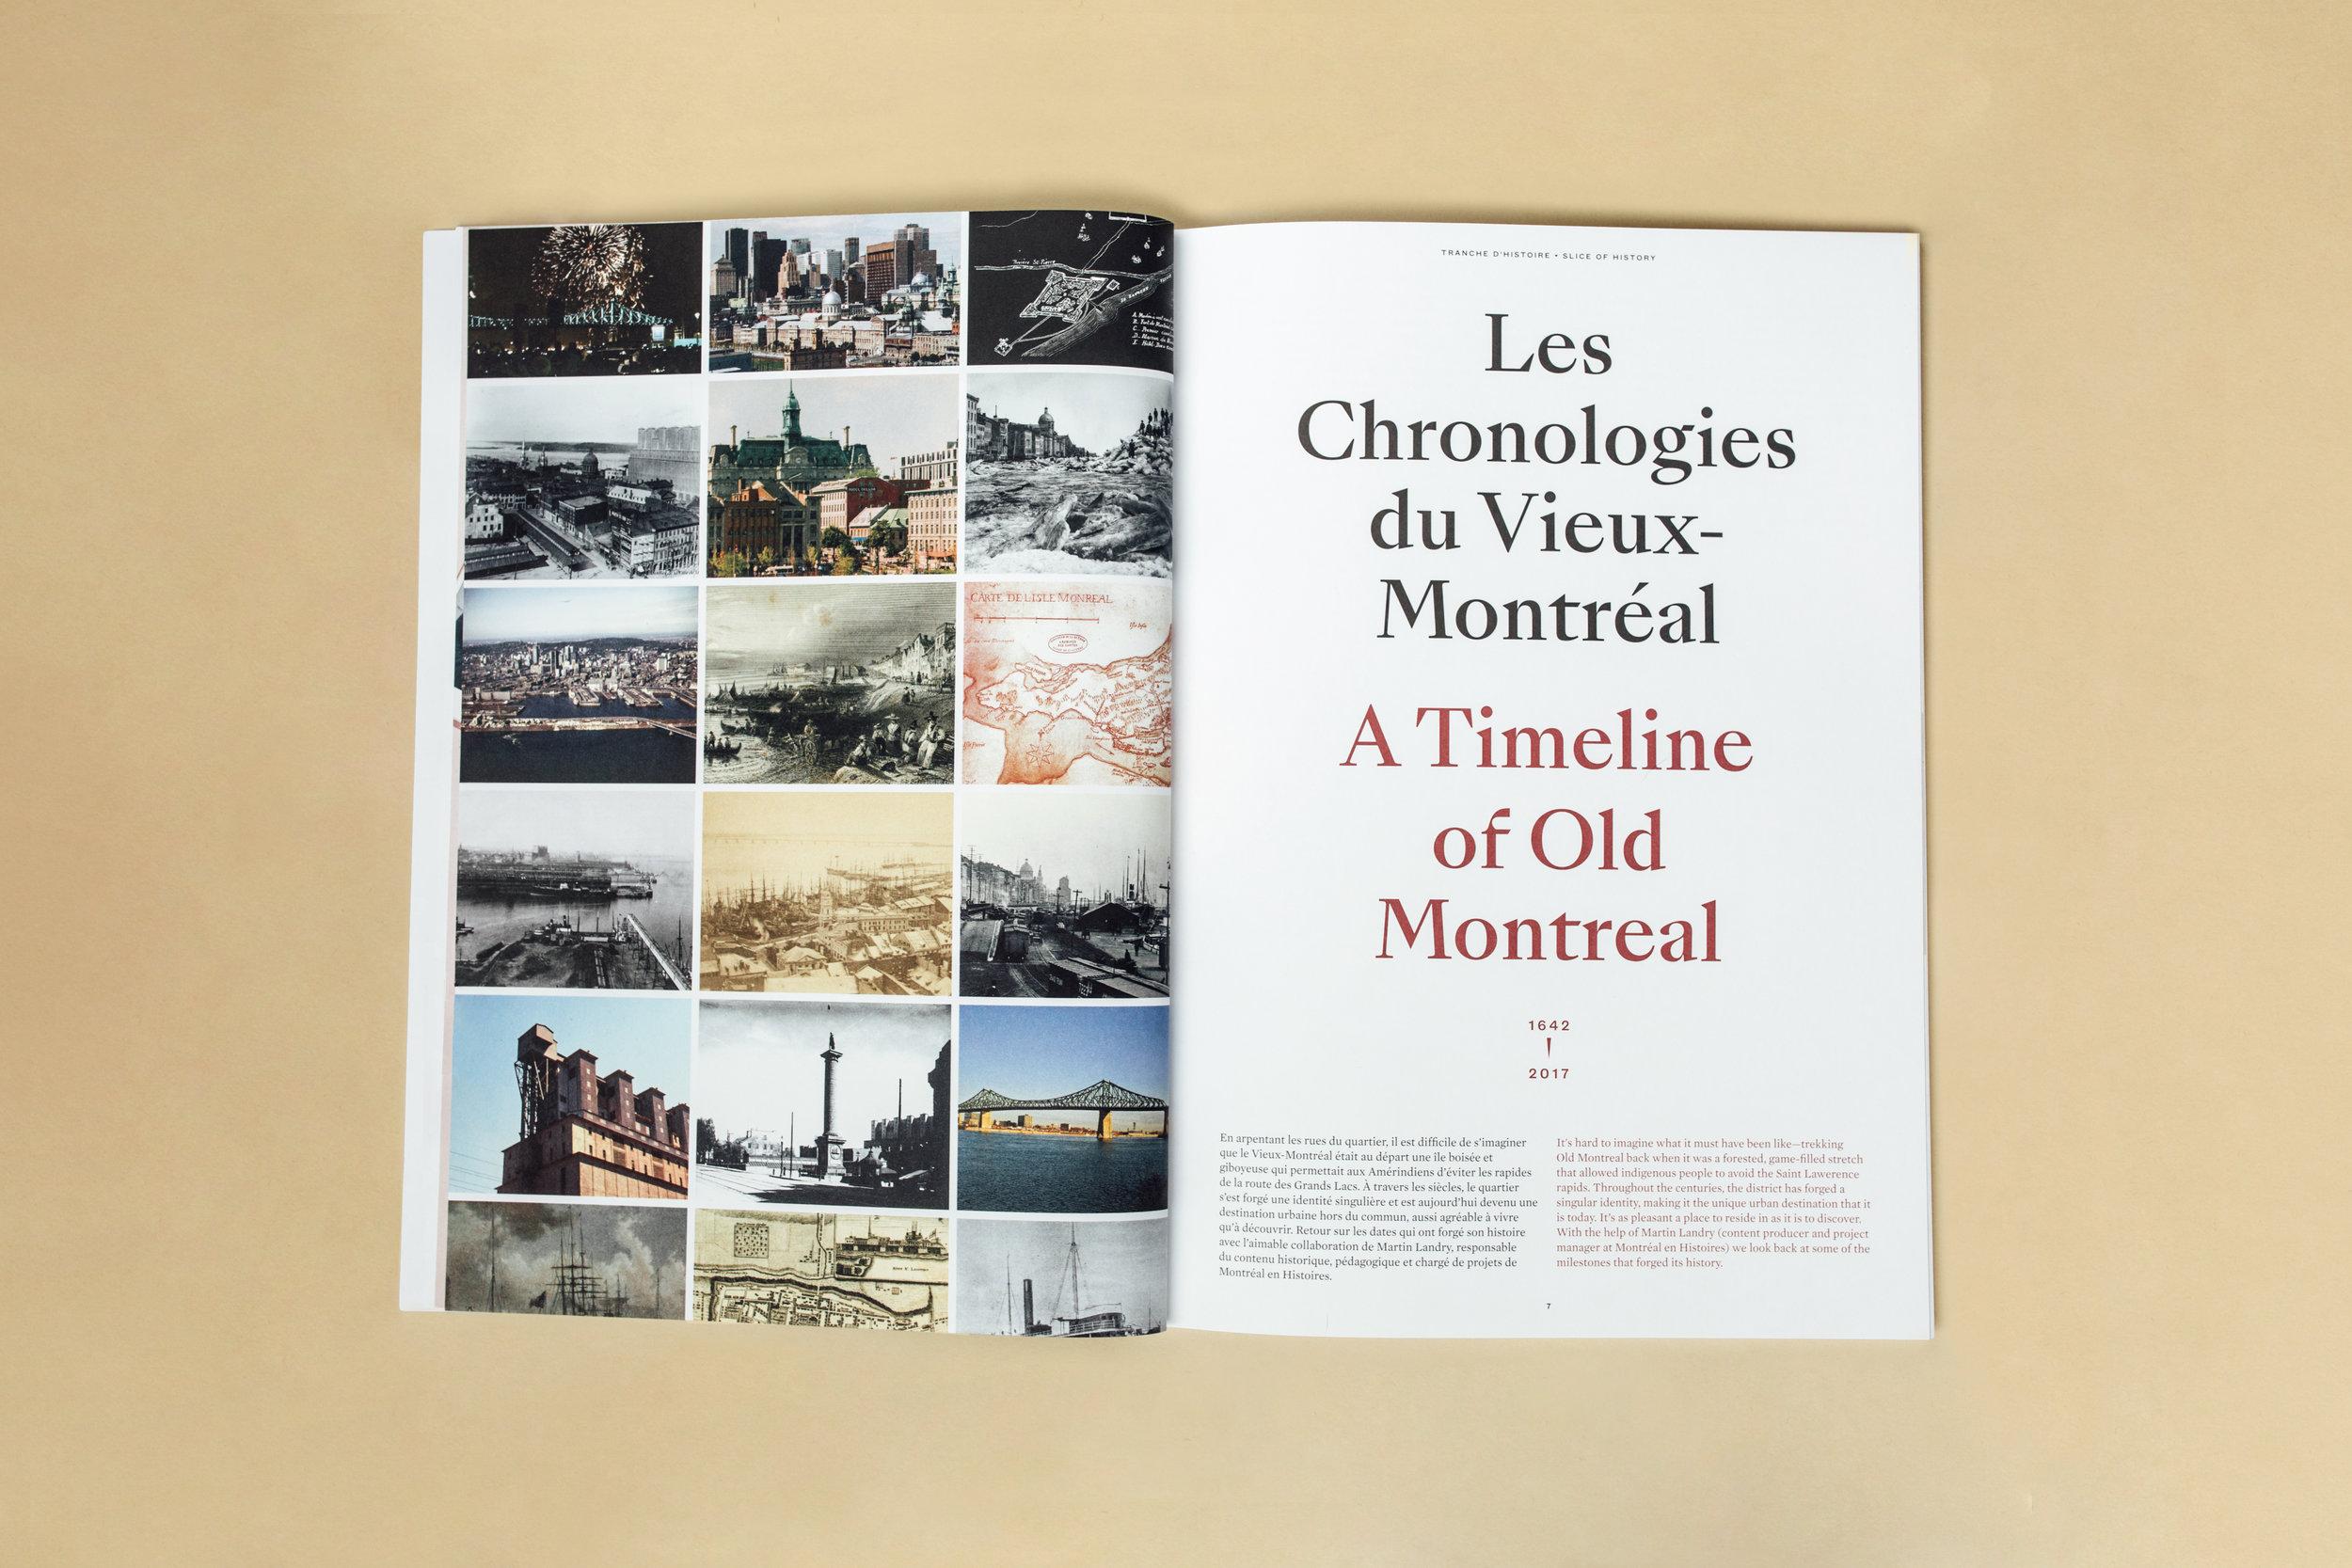 Montreal_la croisee_prevel_stephanie aubin.jpg.jpg